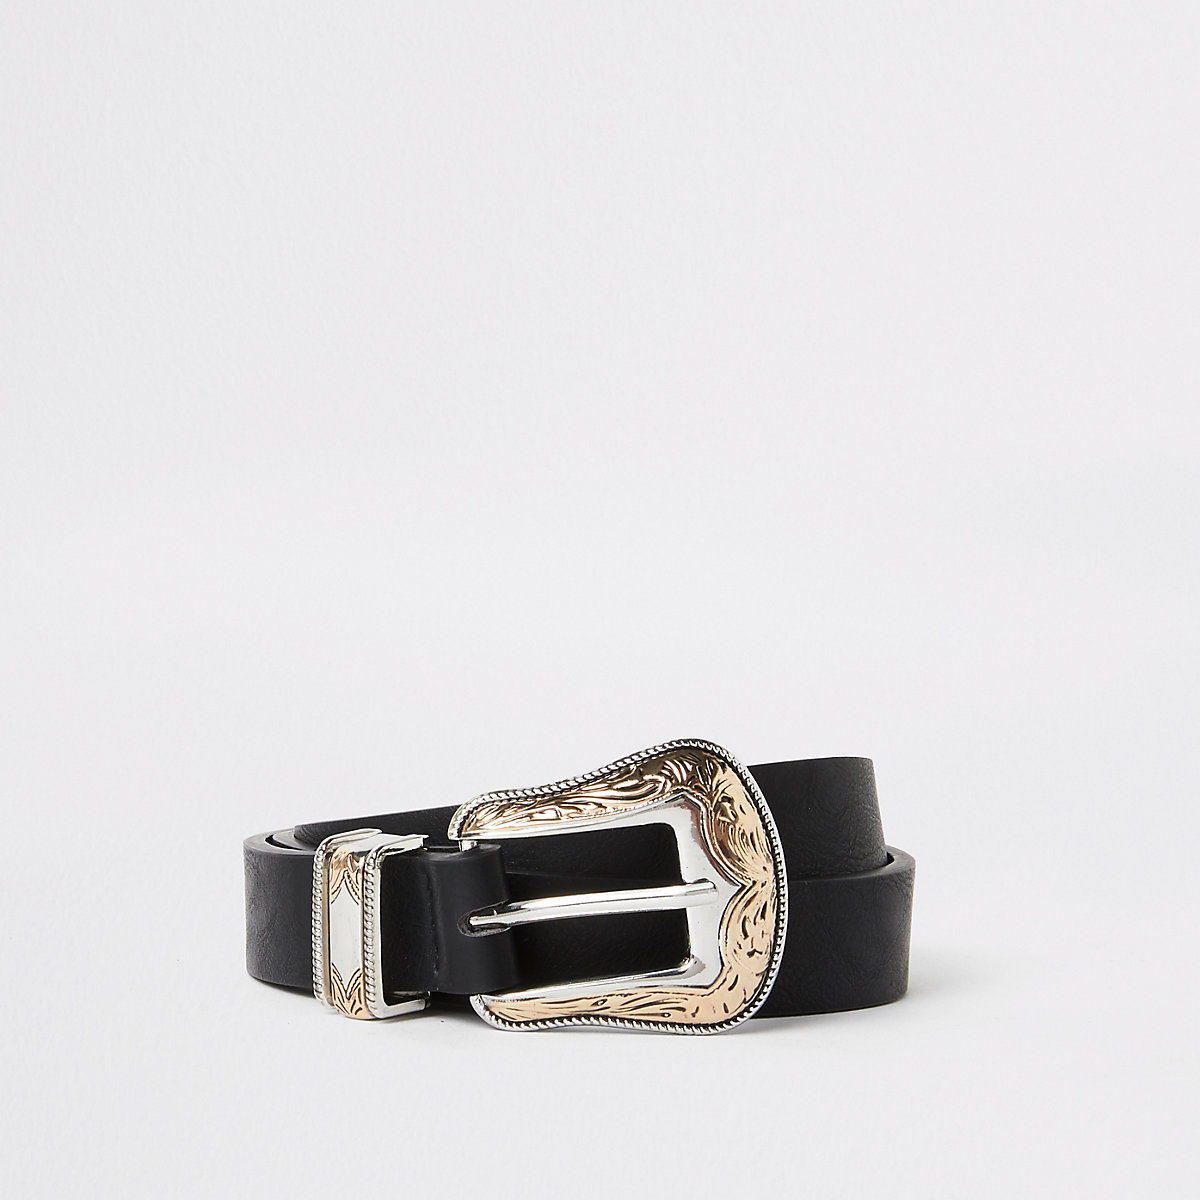 Black western style two-toned buckle belt